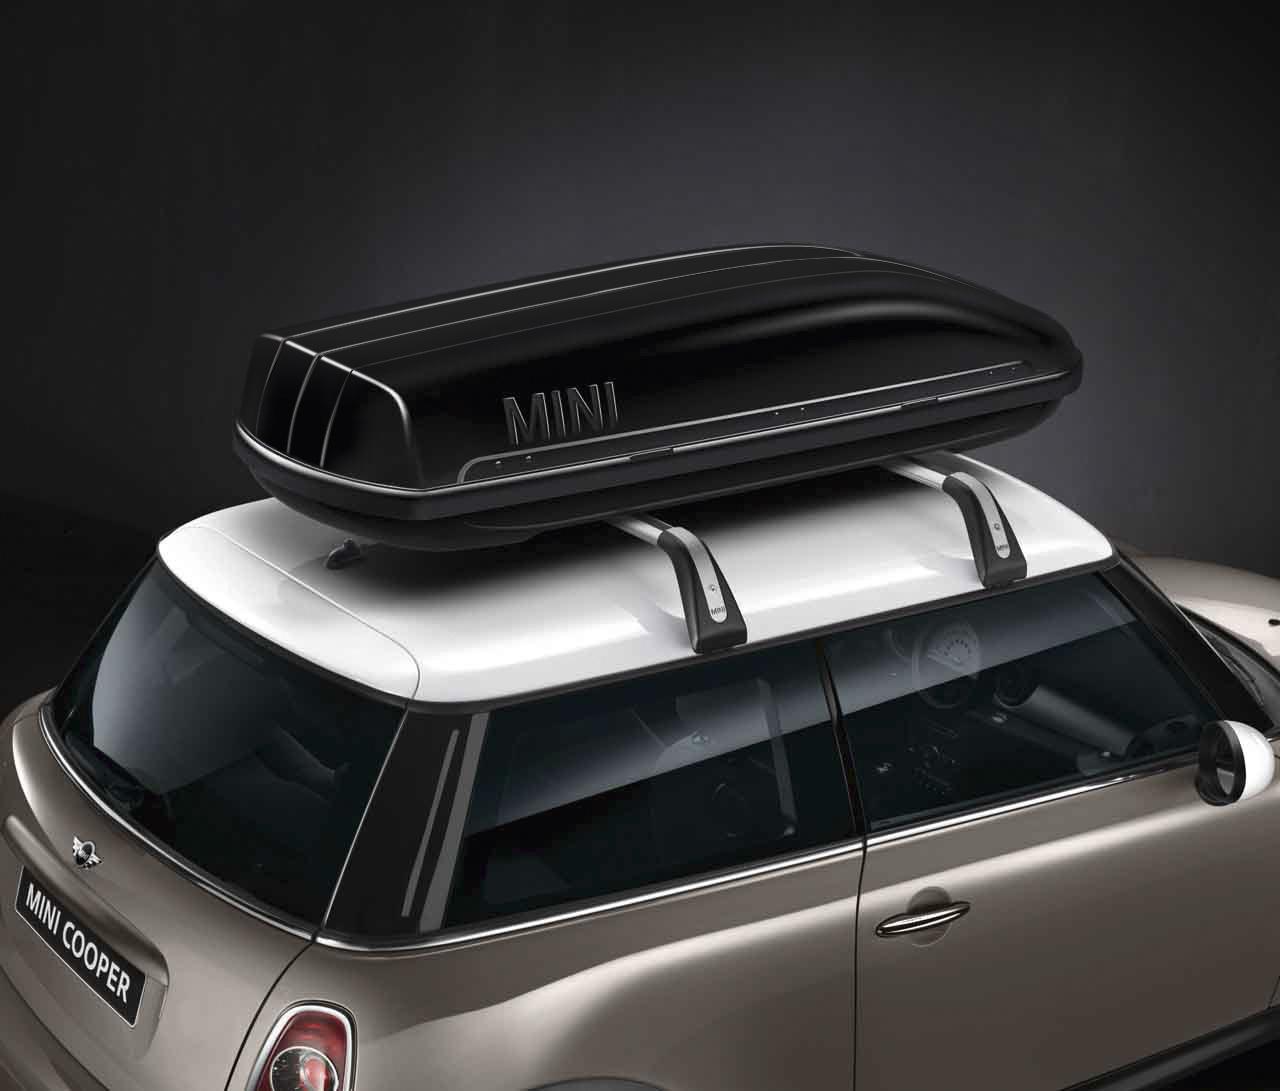 MINI Genuine Roof Box / Storage Travel Container Black 320 ...